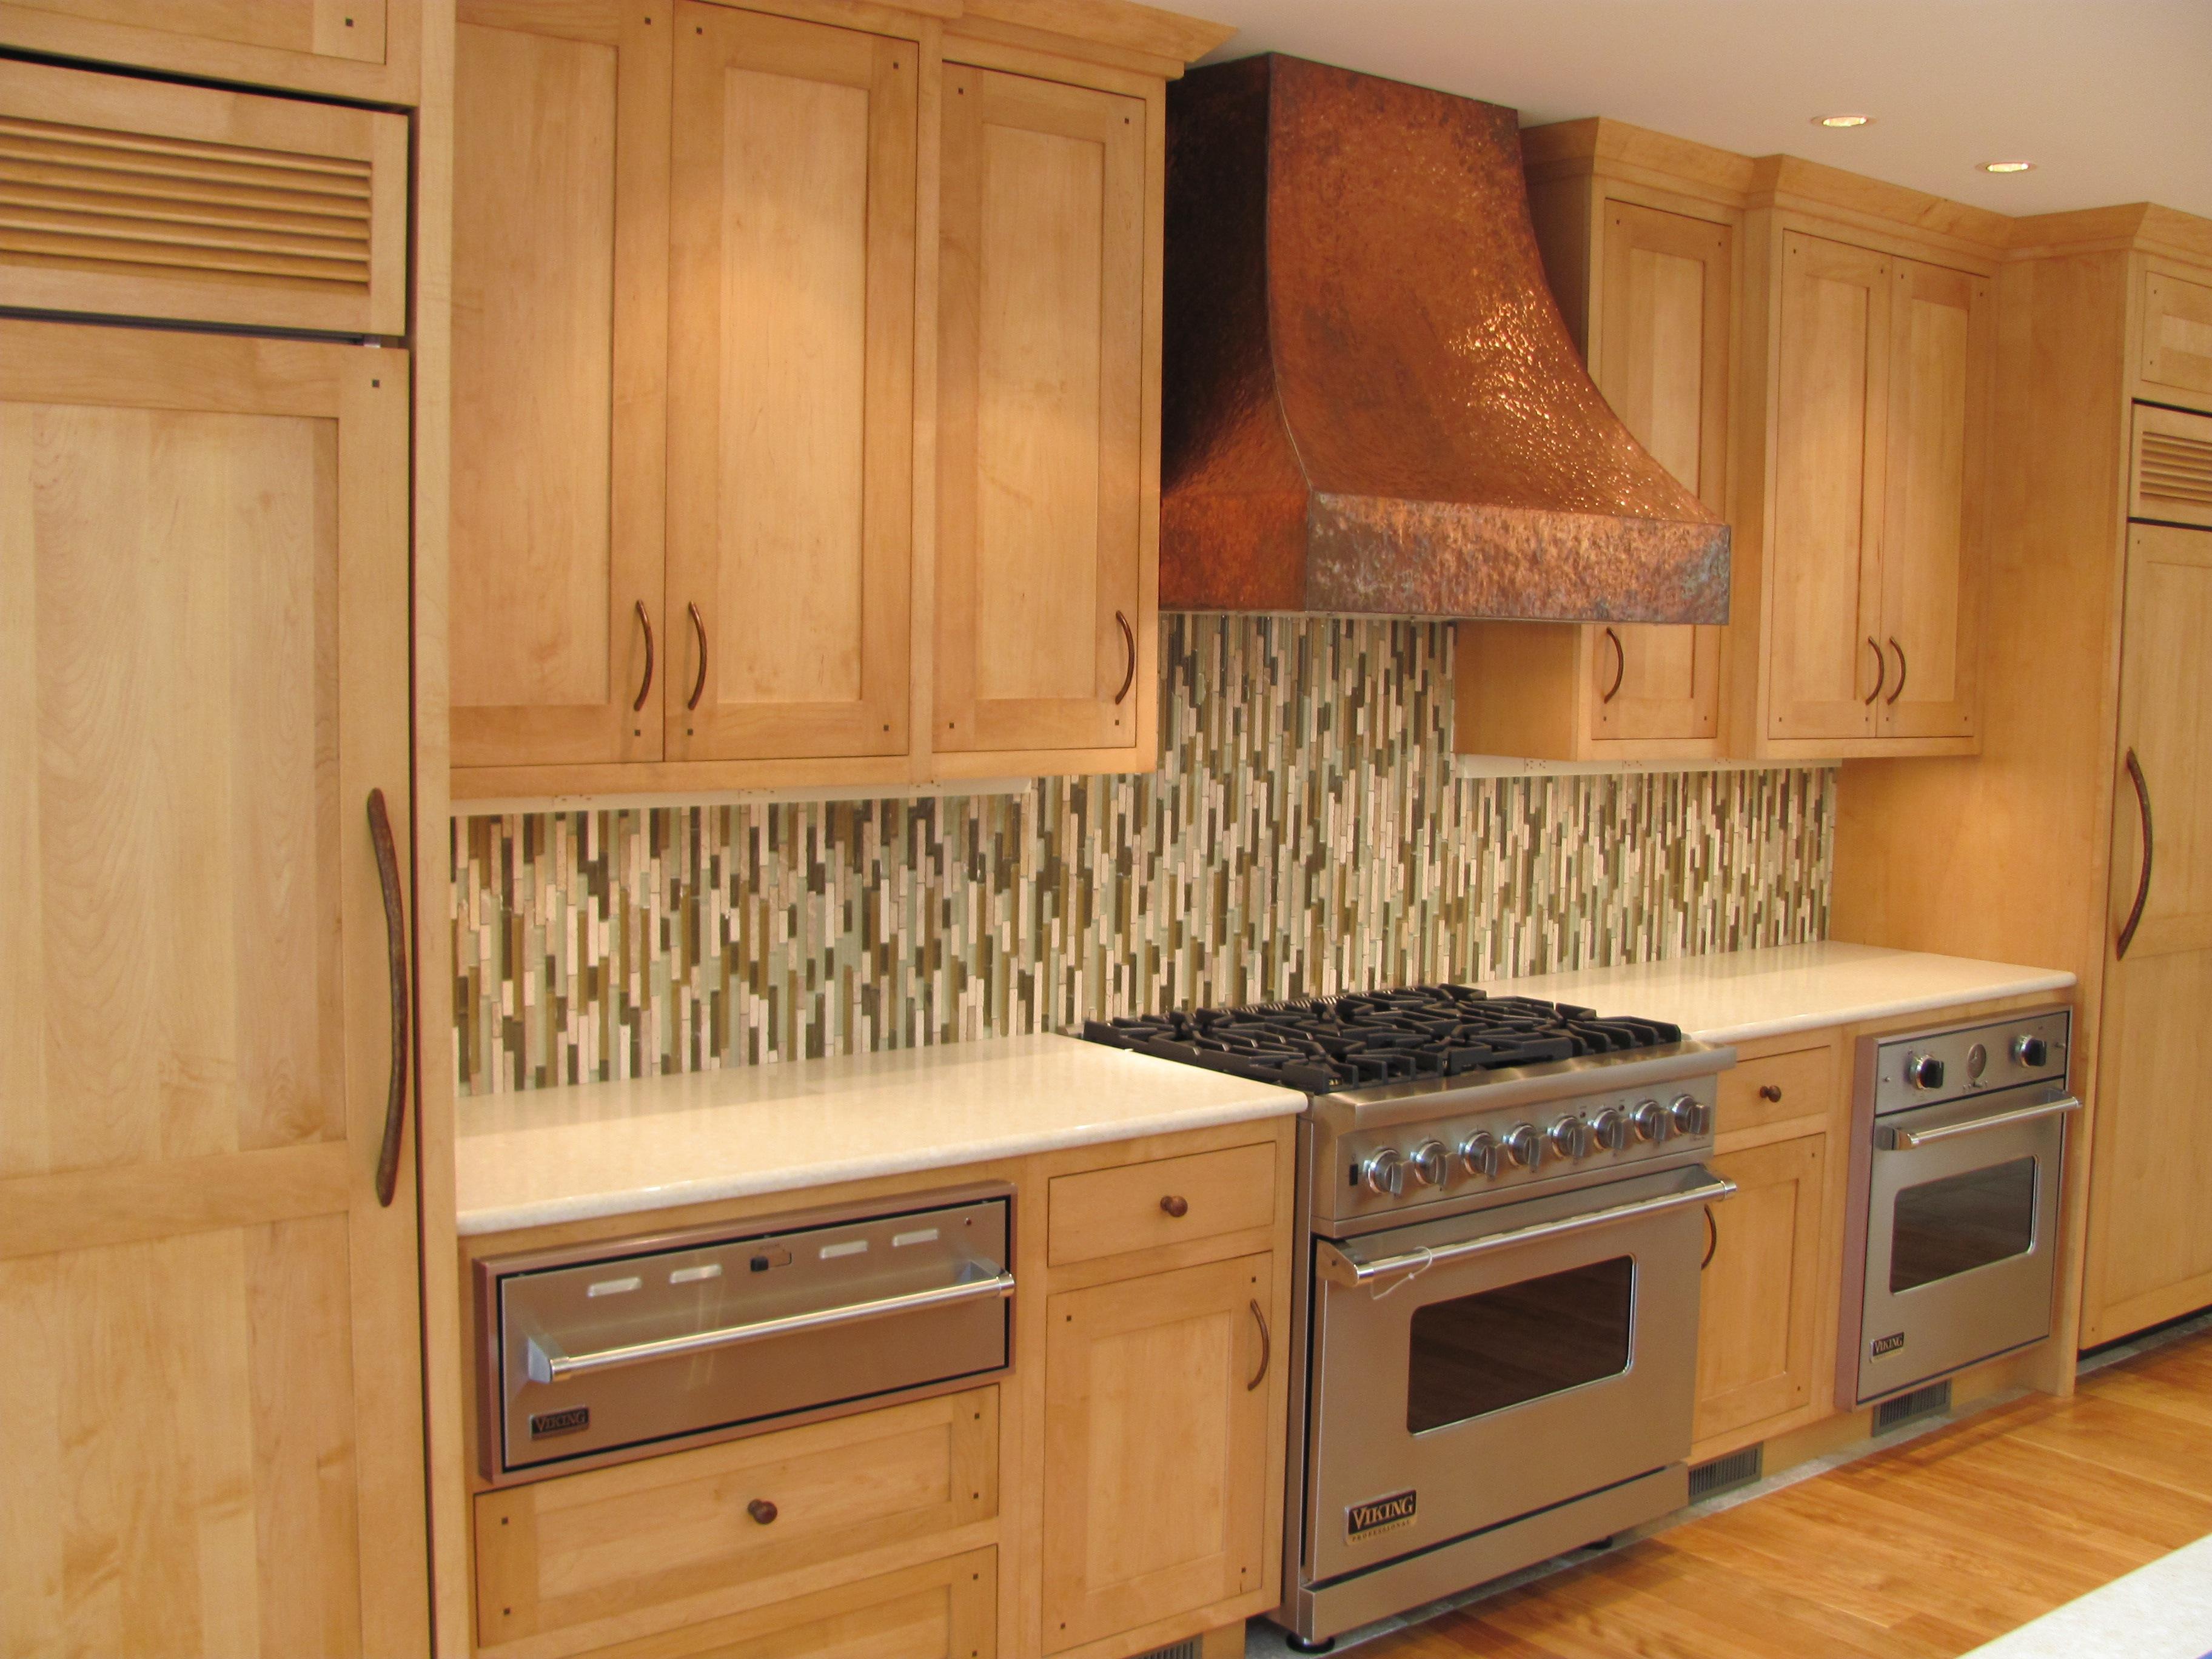 How to install bathroom backsplash - How To Install Glass Tile Backsplash In Kitchen How To Install Glass Tile Backsplash In Bathroom